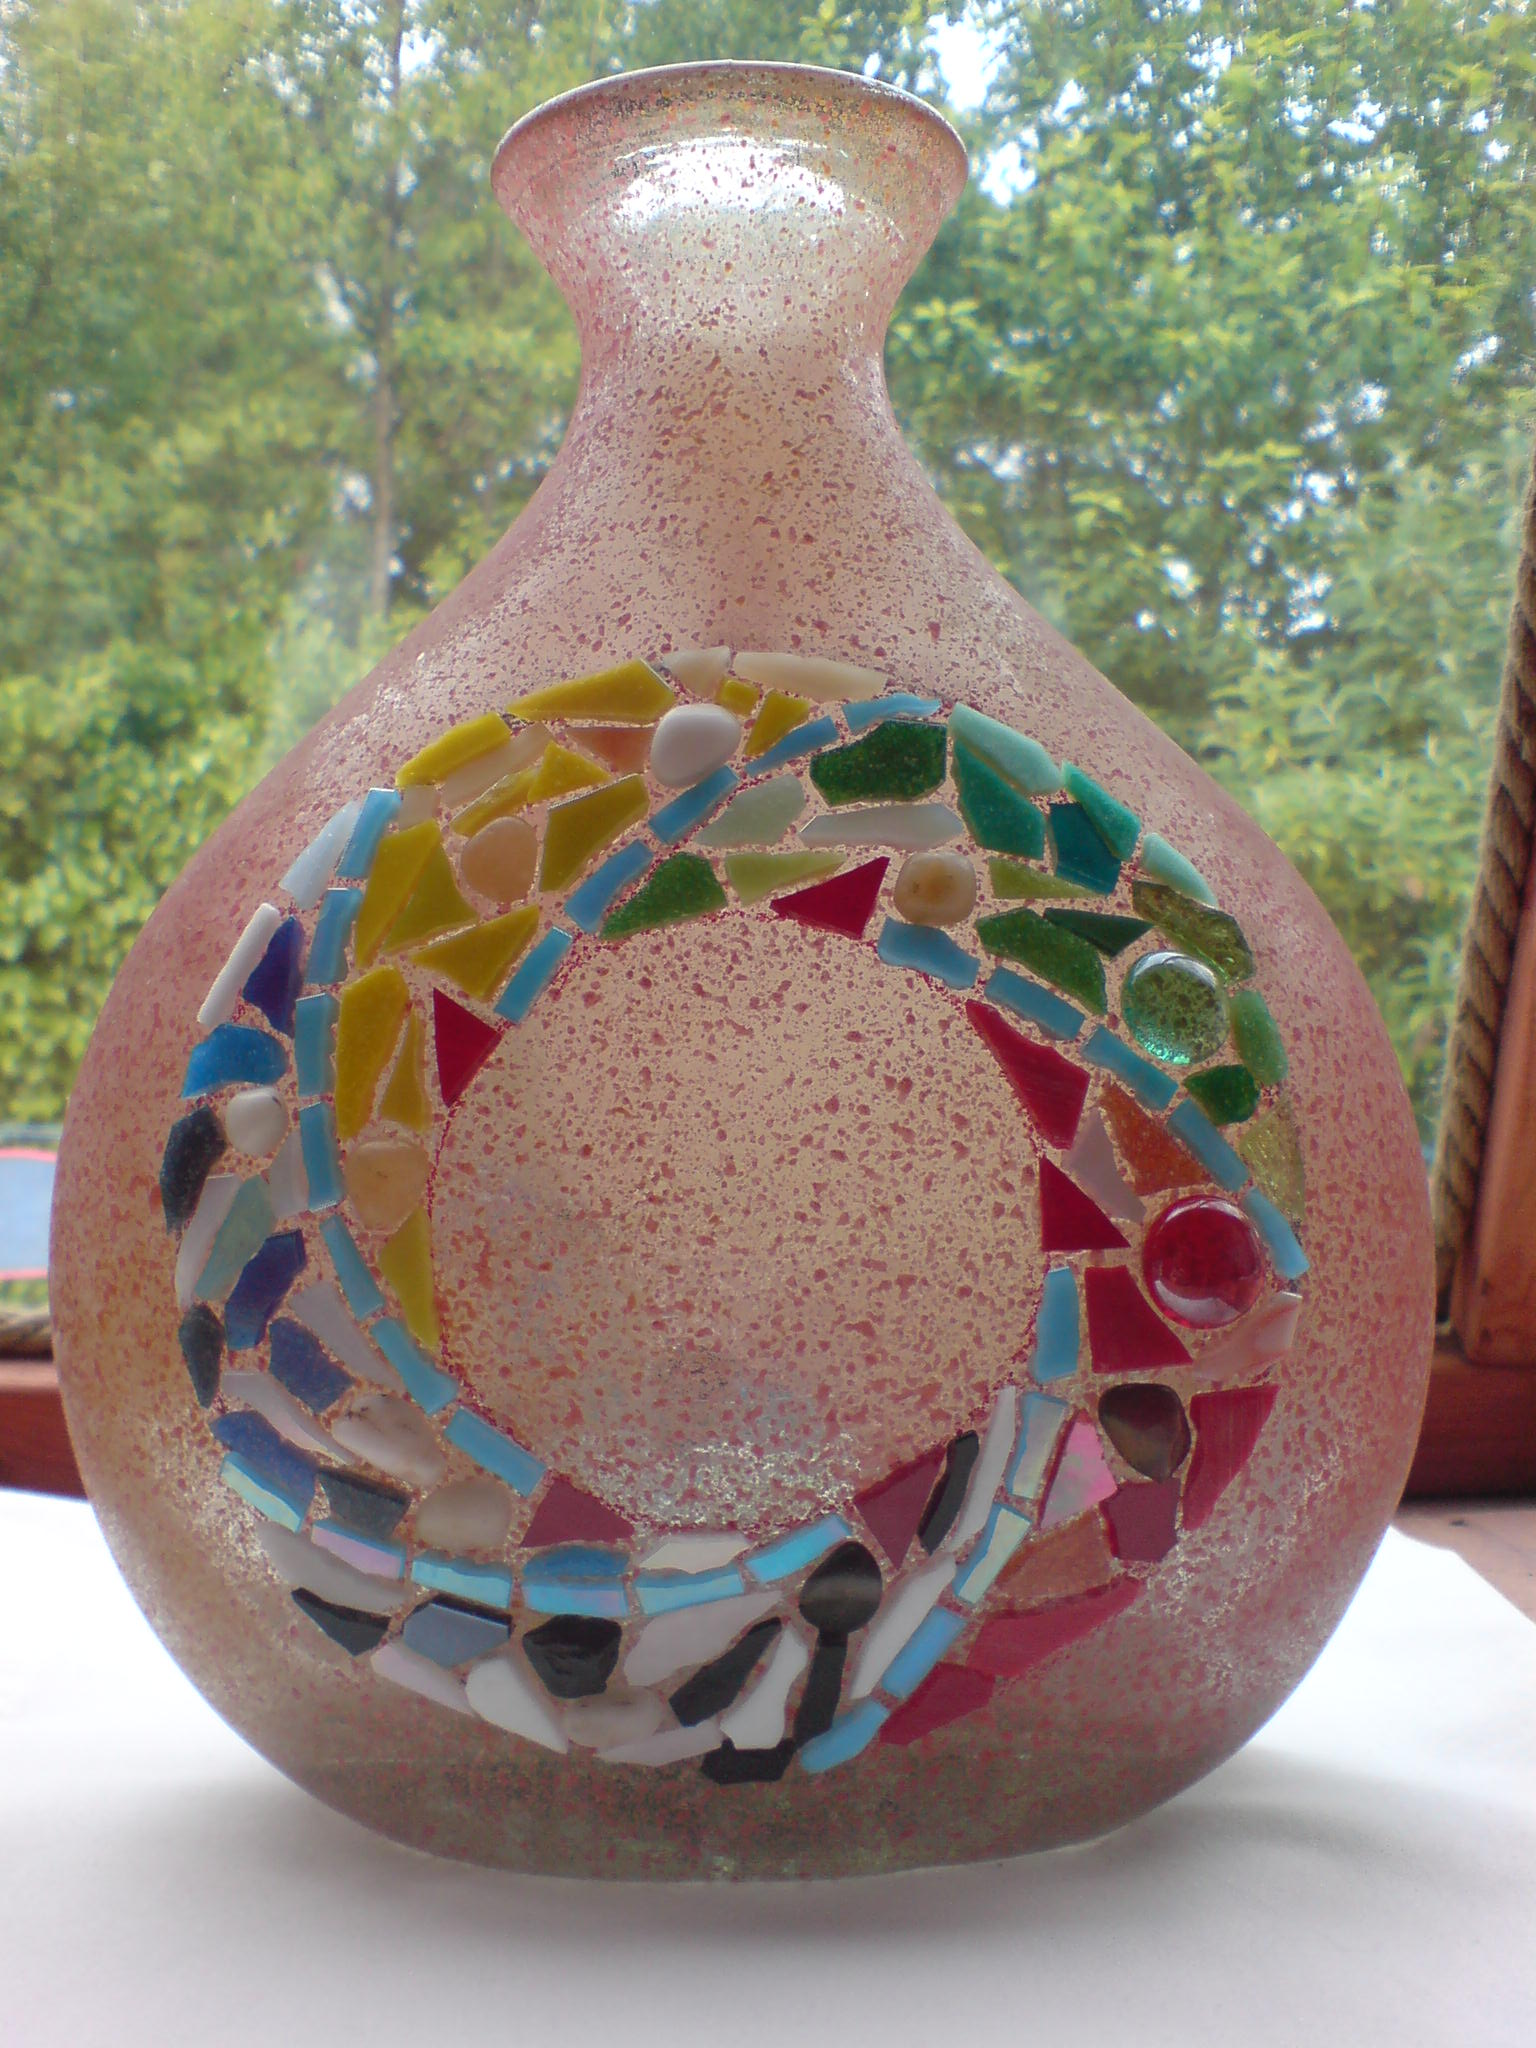 For S., Gisela Gibbon Mosaic Artist Scarborough